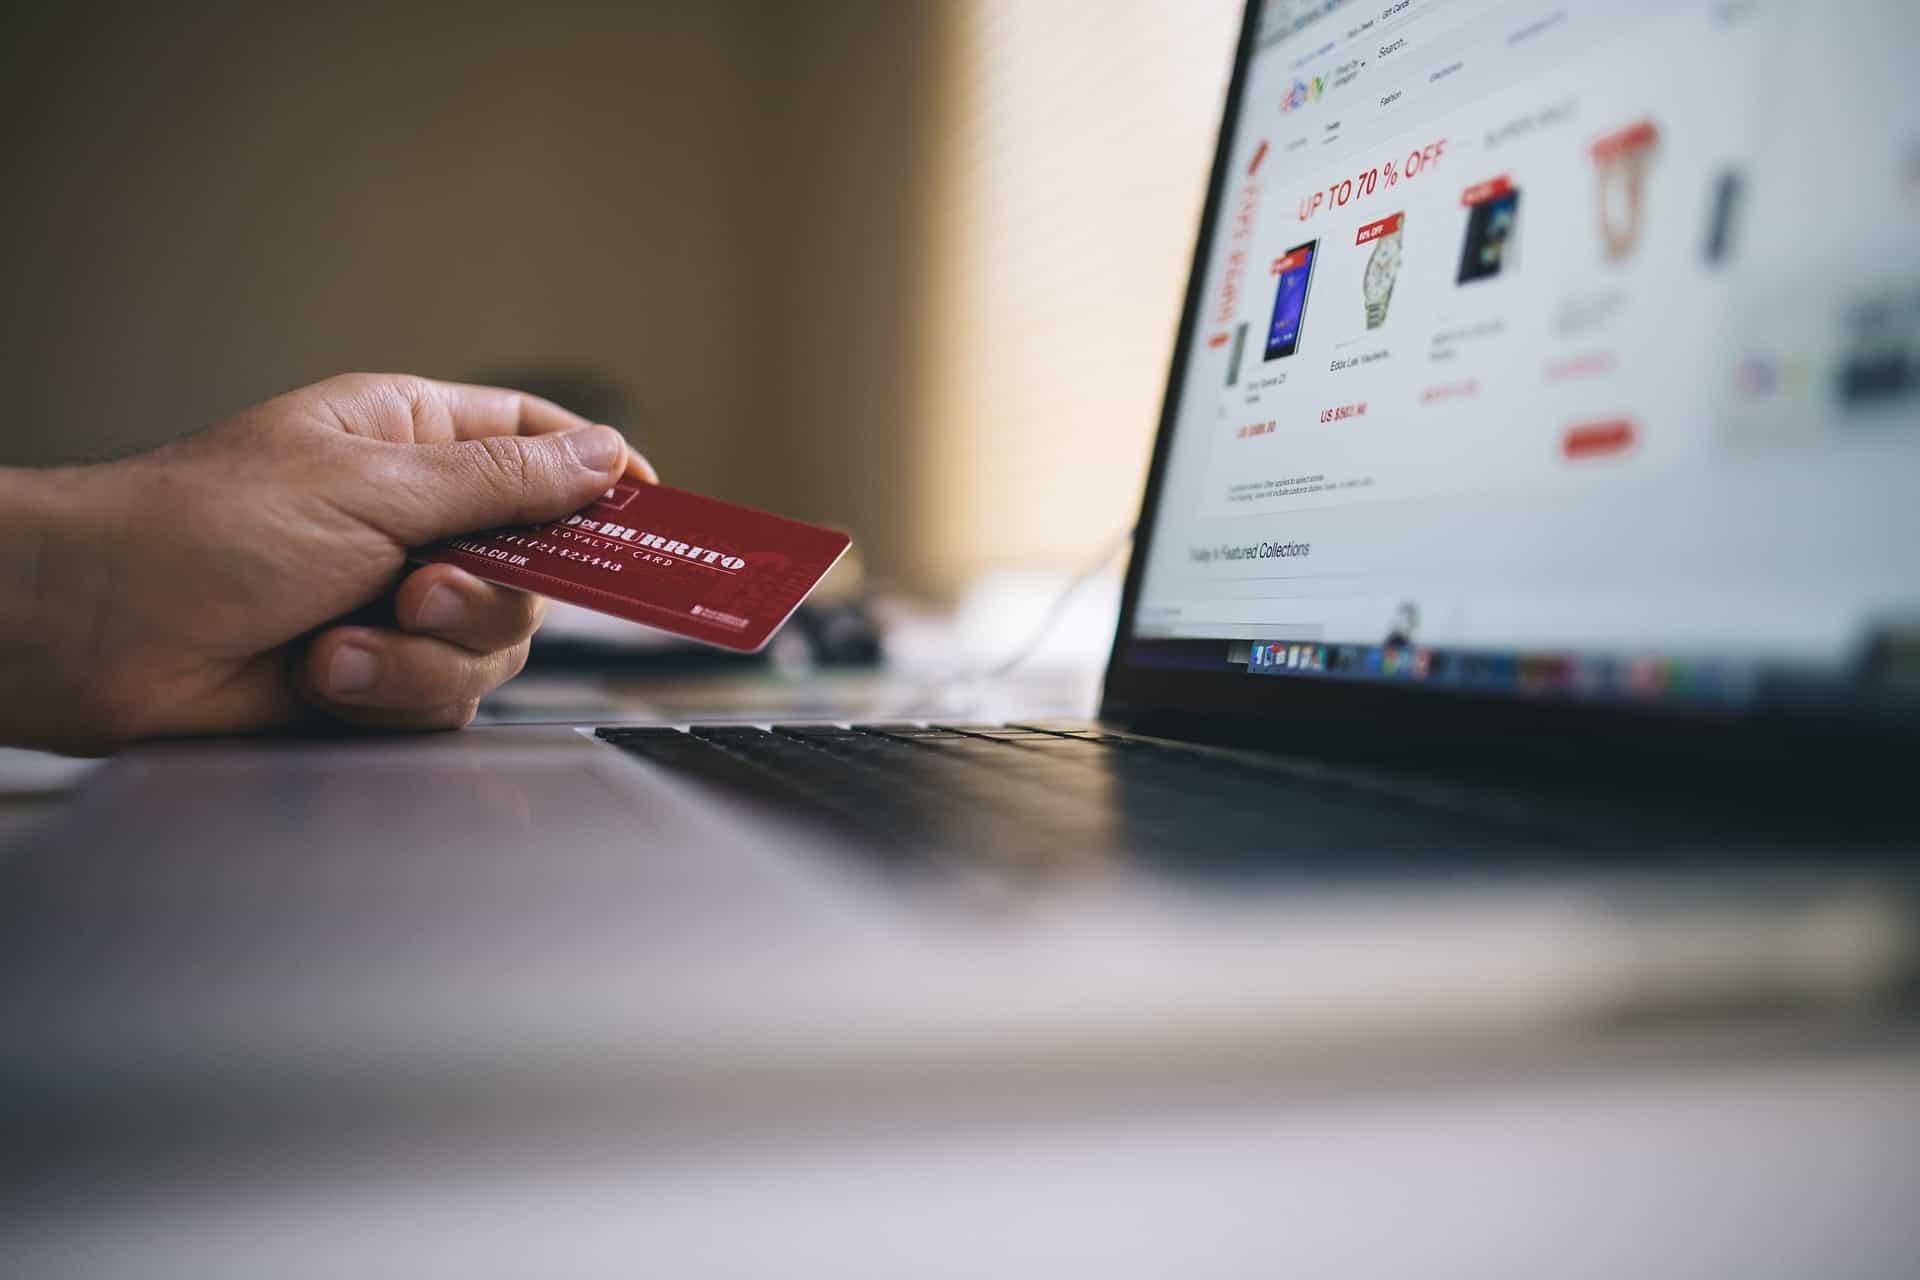 card ecommerce laptop